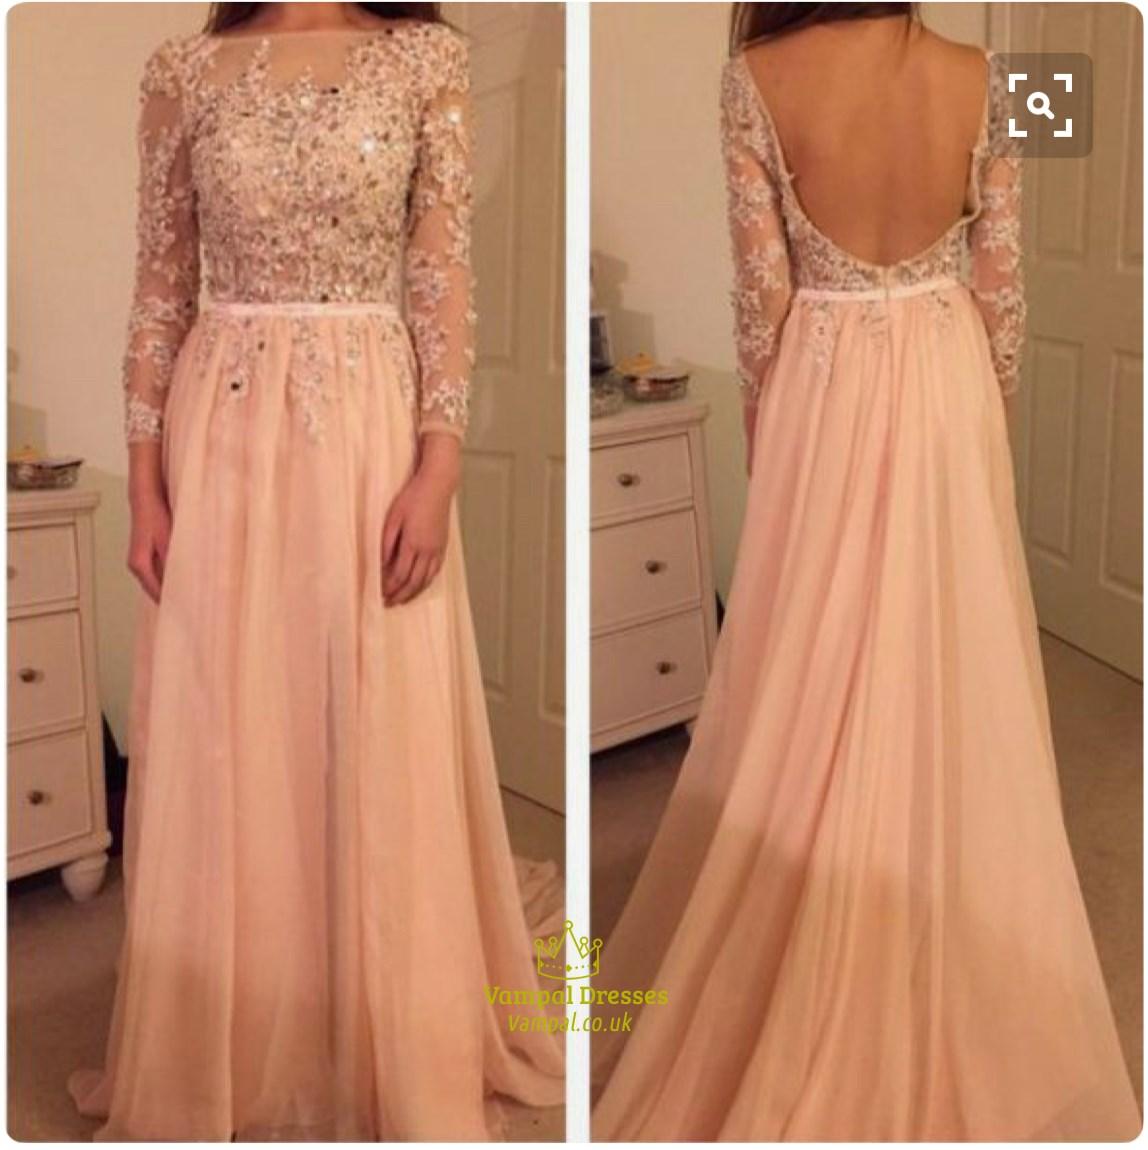 Blush Pink Illusion Lace Long Sleeve Backless Full Length